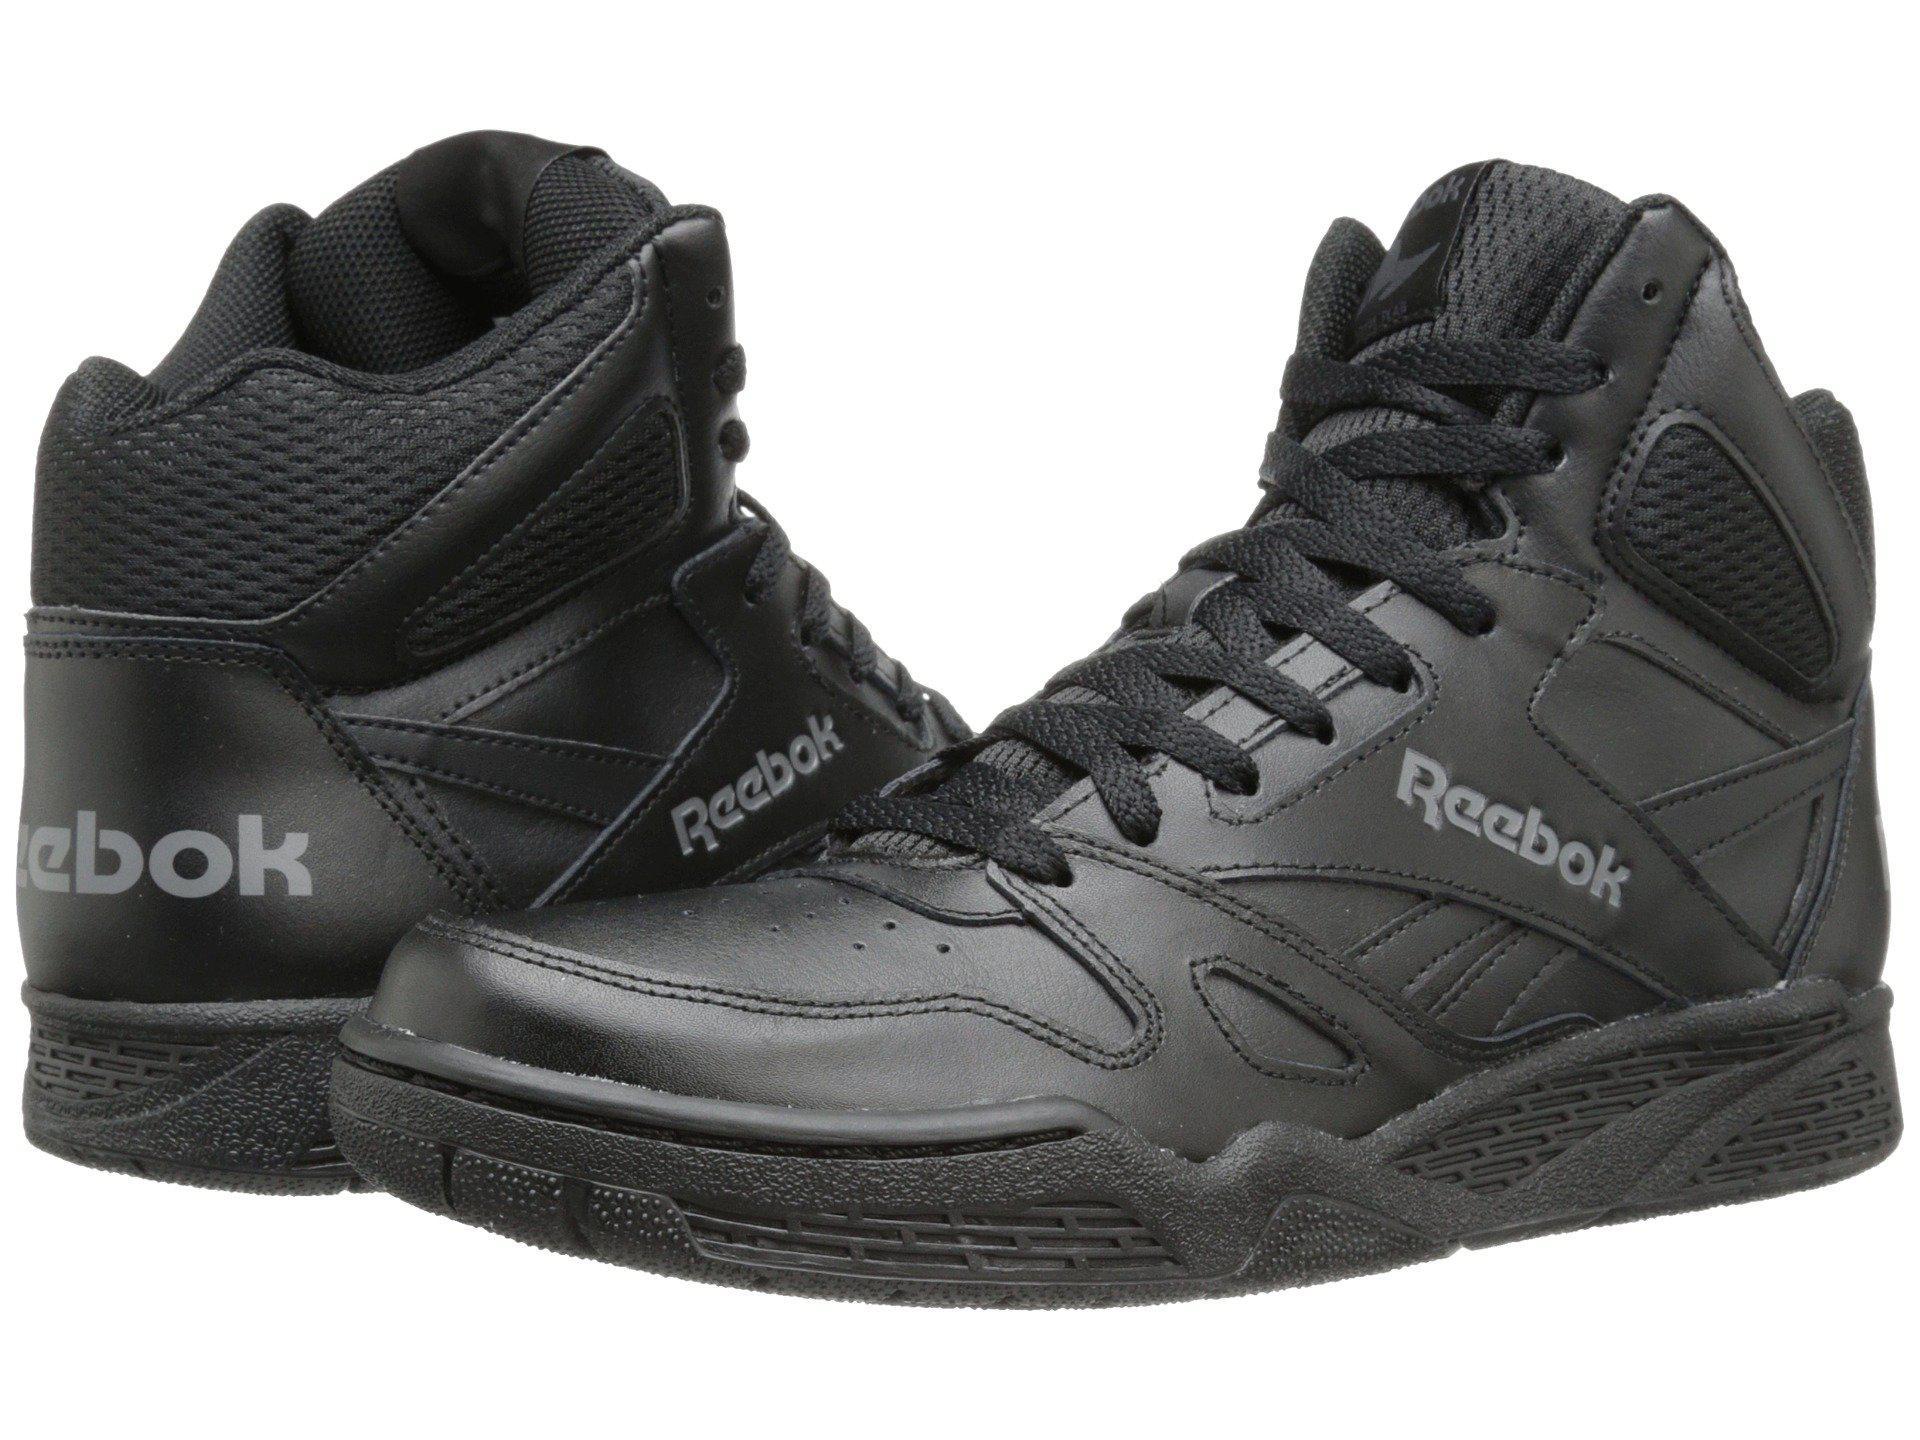 a13acb87616 Lyst - Reebok Royal Bb4500 Hi (black shark) Men s Basketball Shoes ...